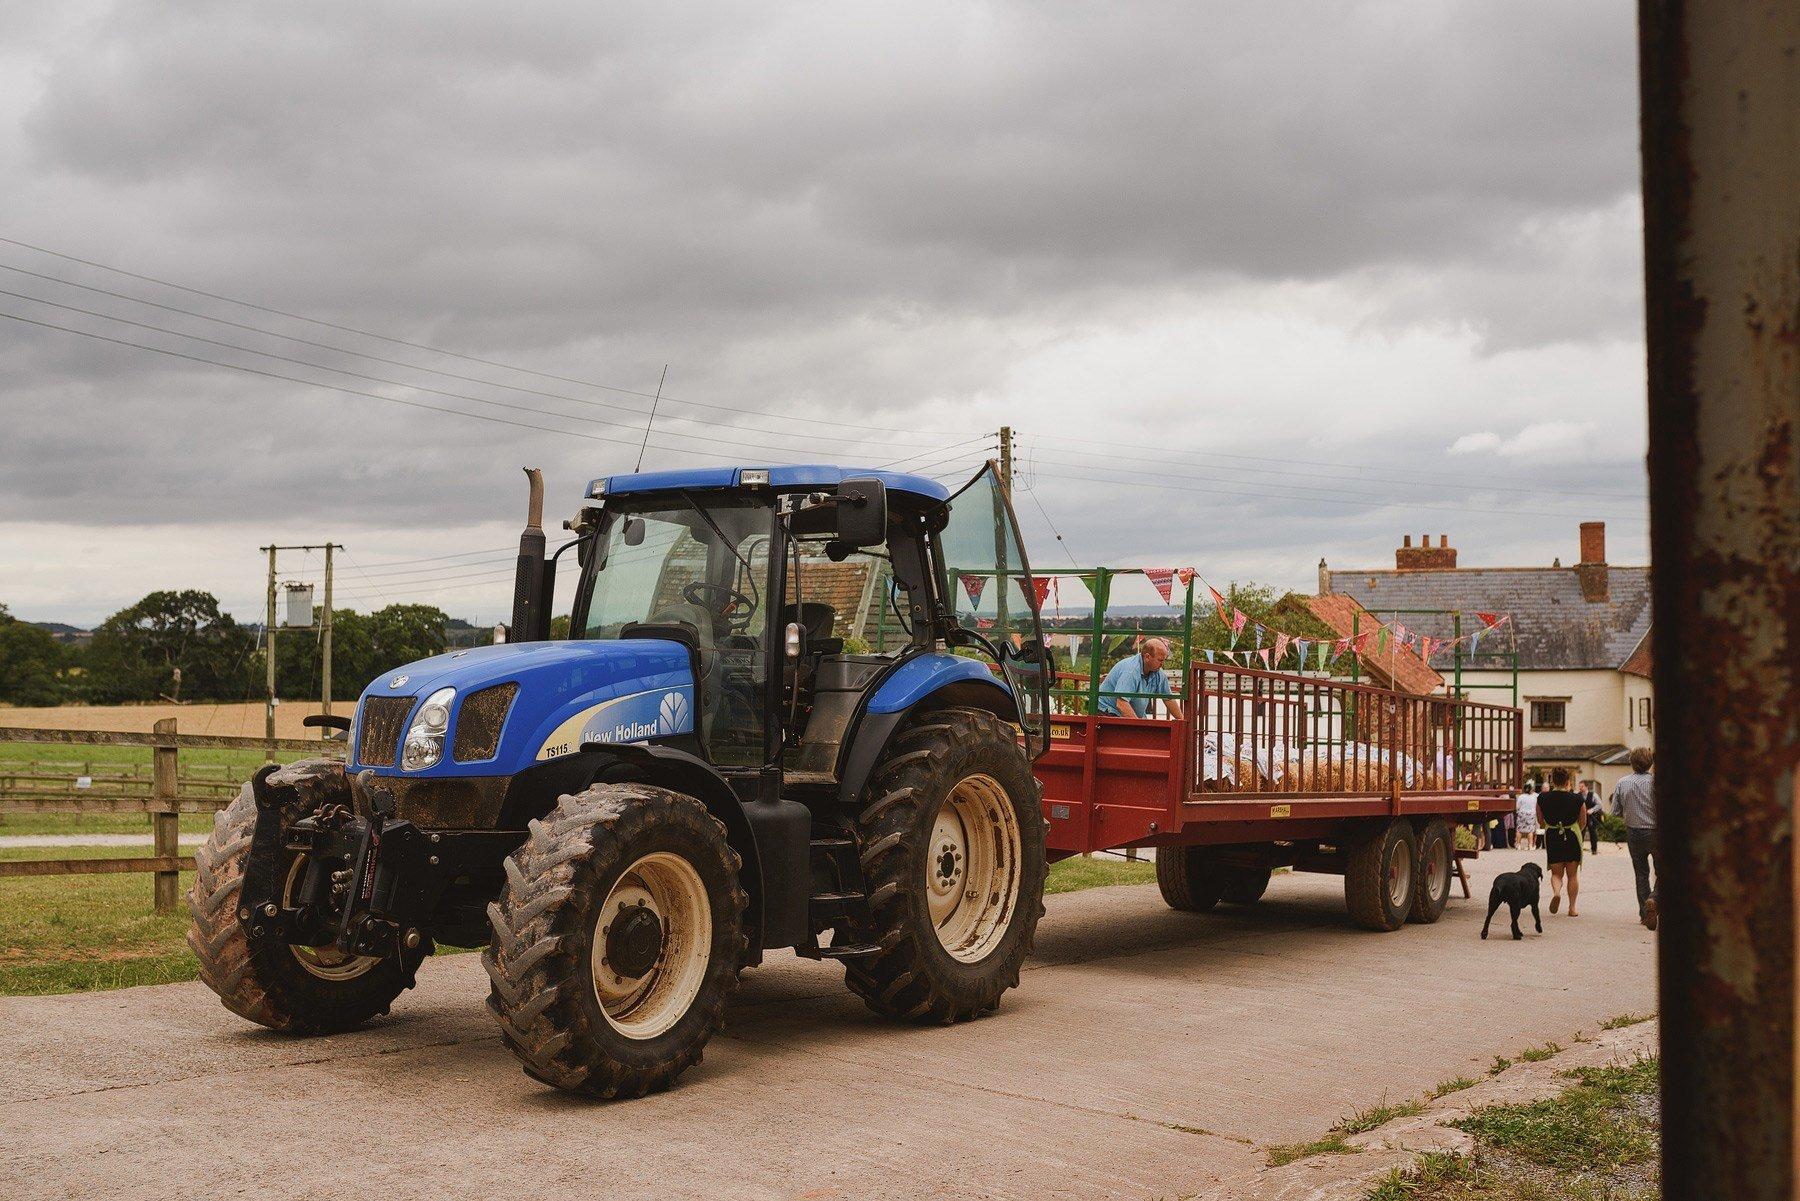 tractor at huntstile organic farm